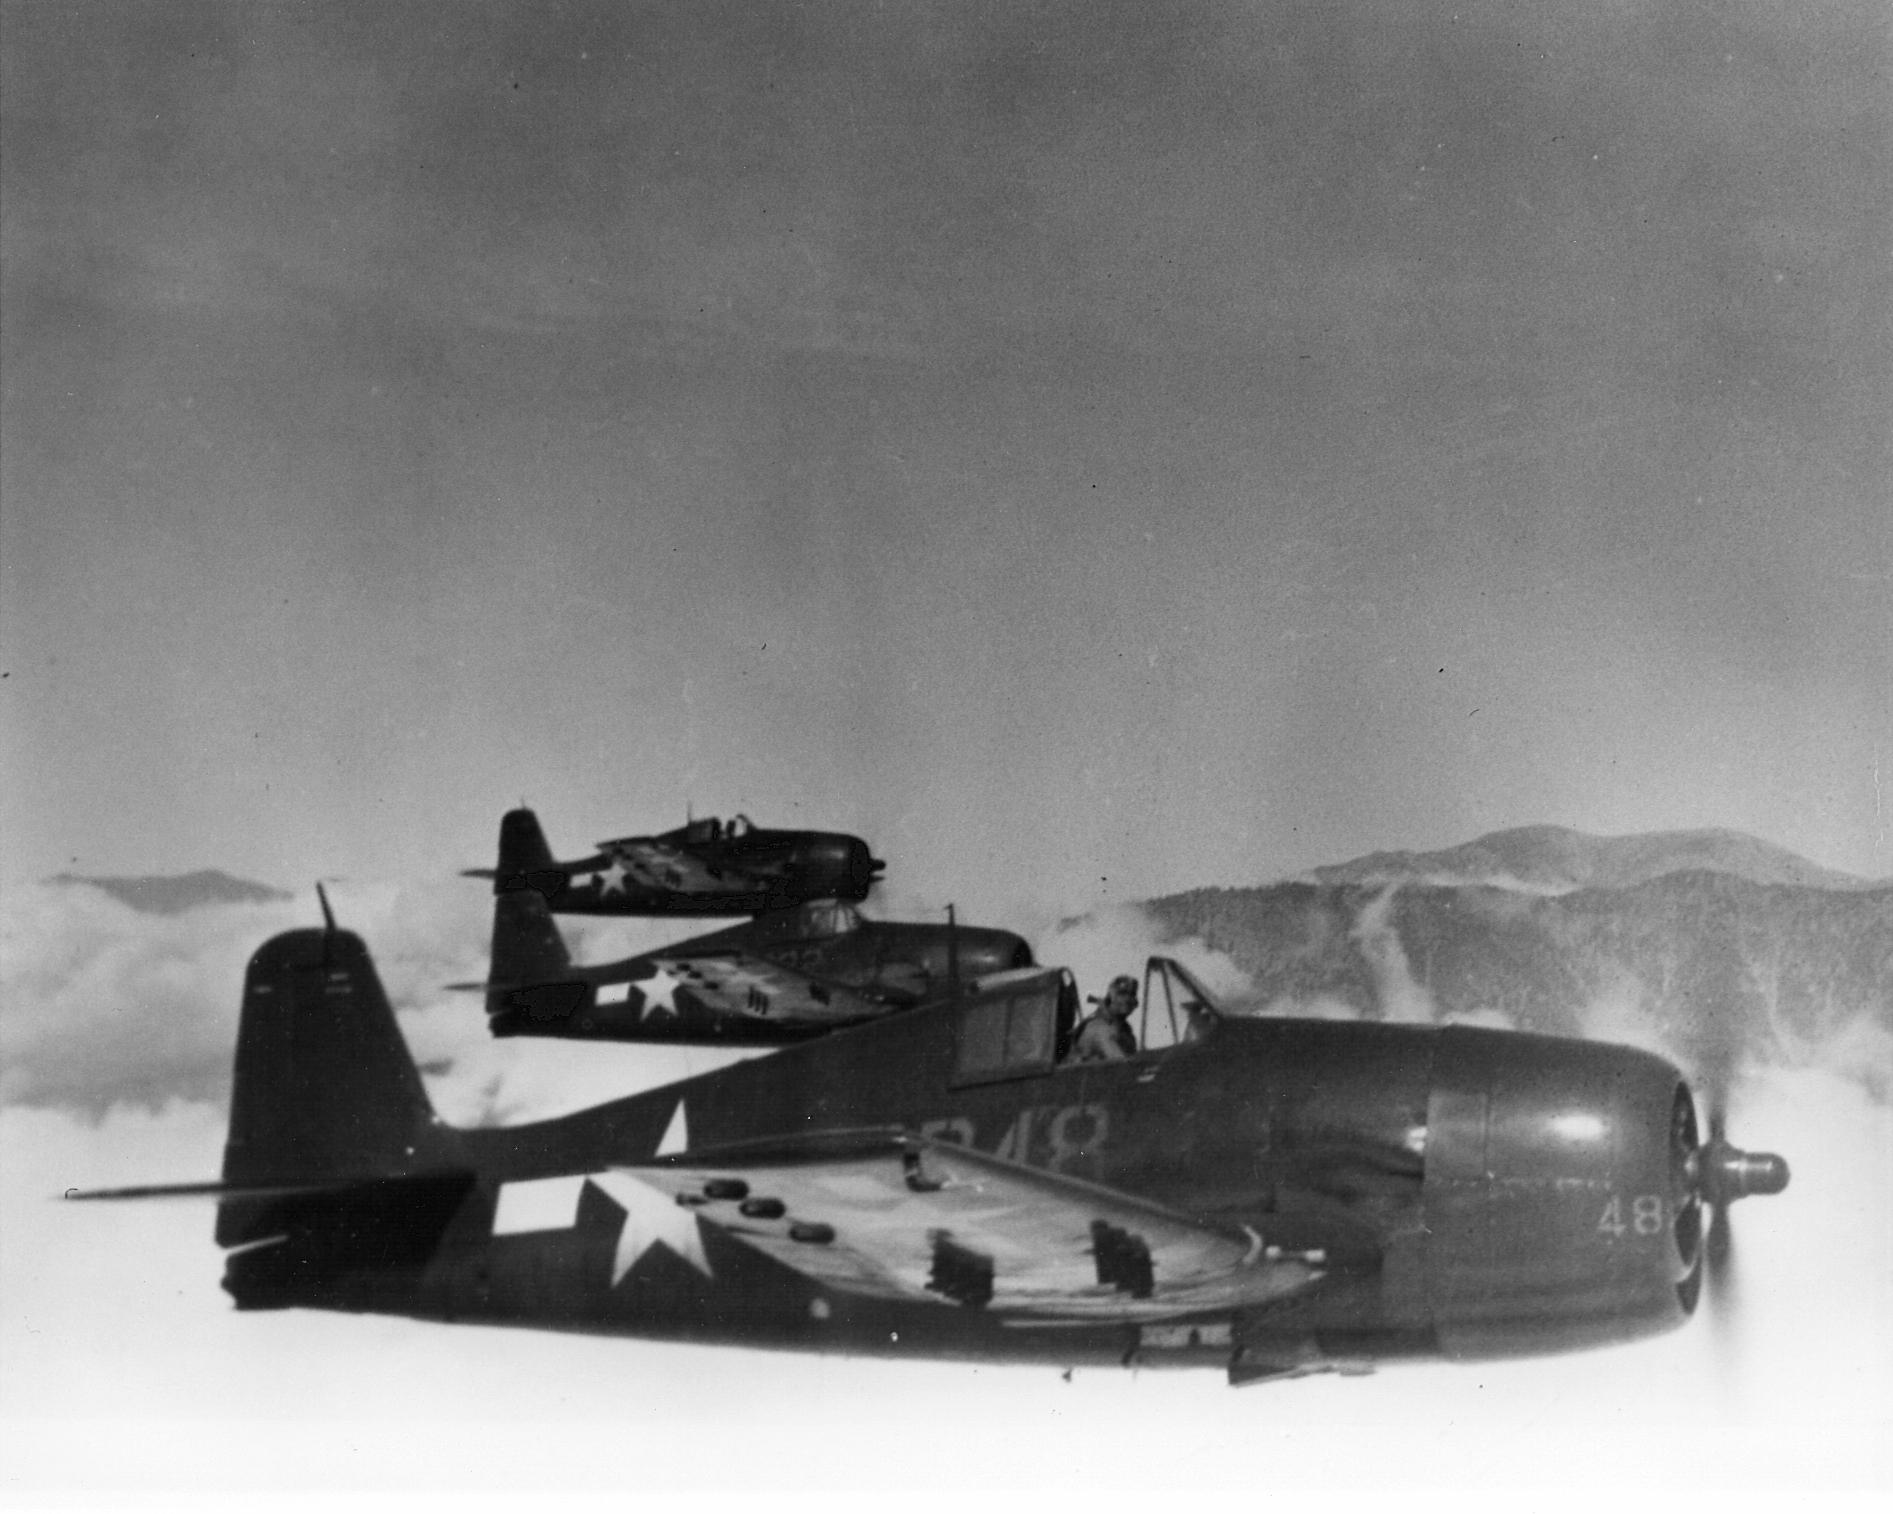 Grumman F6F 5 Hellcat VF 14 Red or Yellow 48 01